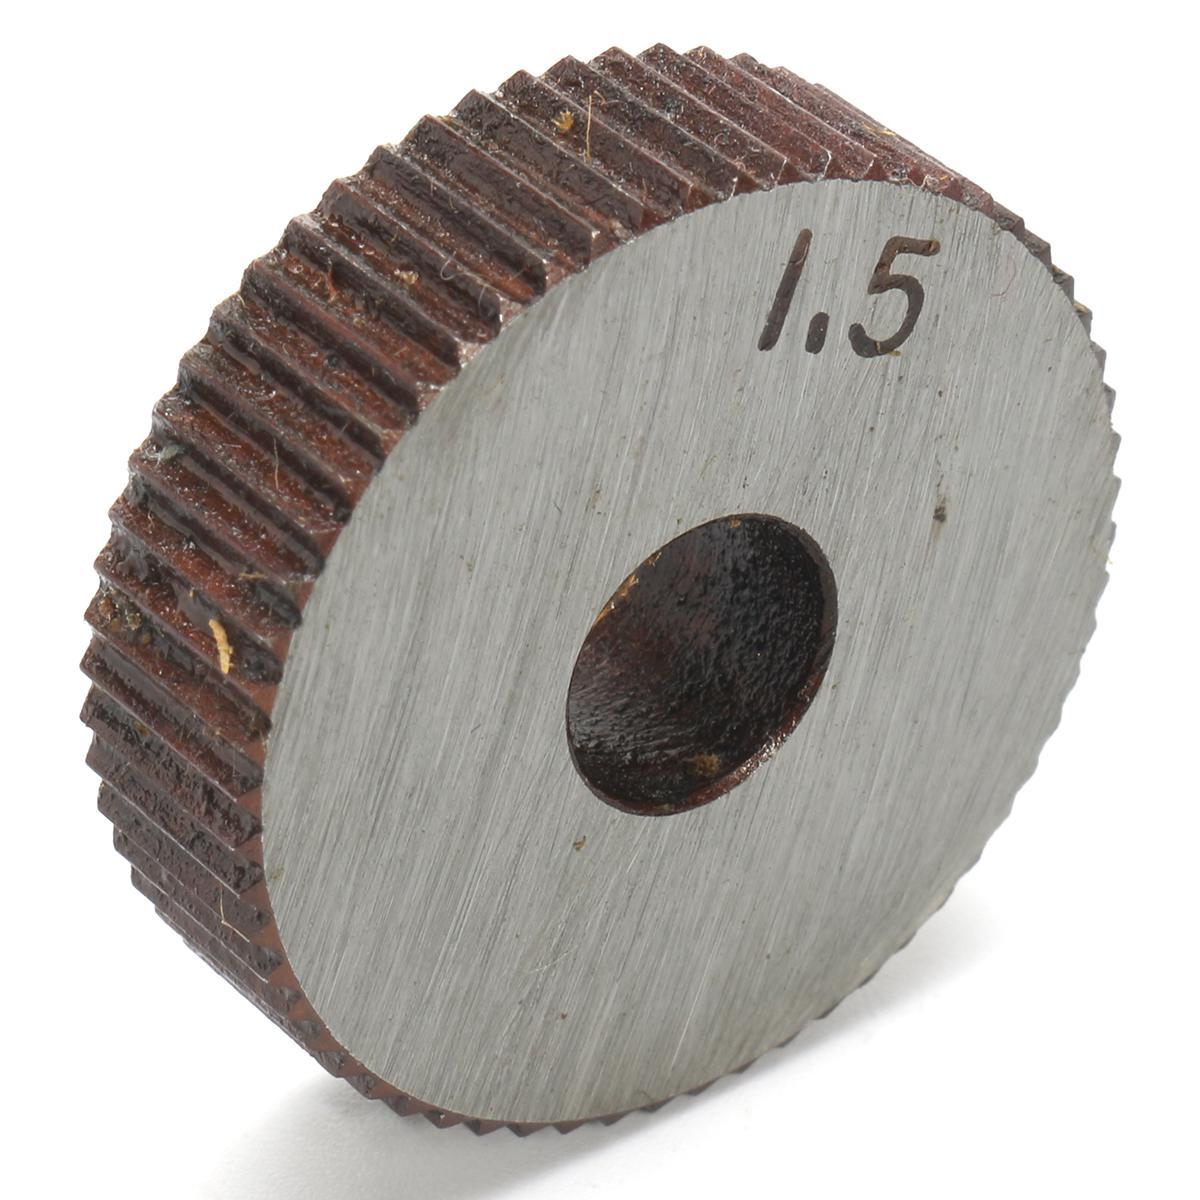 7X Single Wheel Straight Linear Knurling Knurler Tool Set 0.5mm 1.5mm 2mm   A